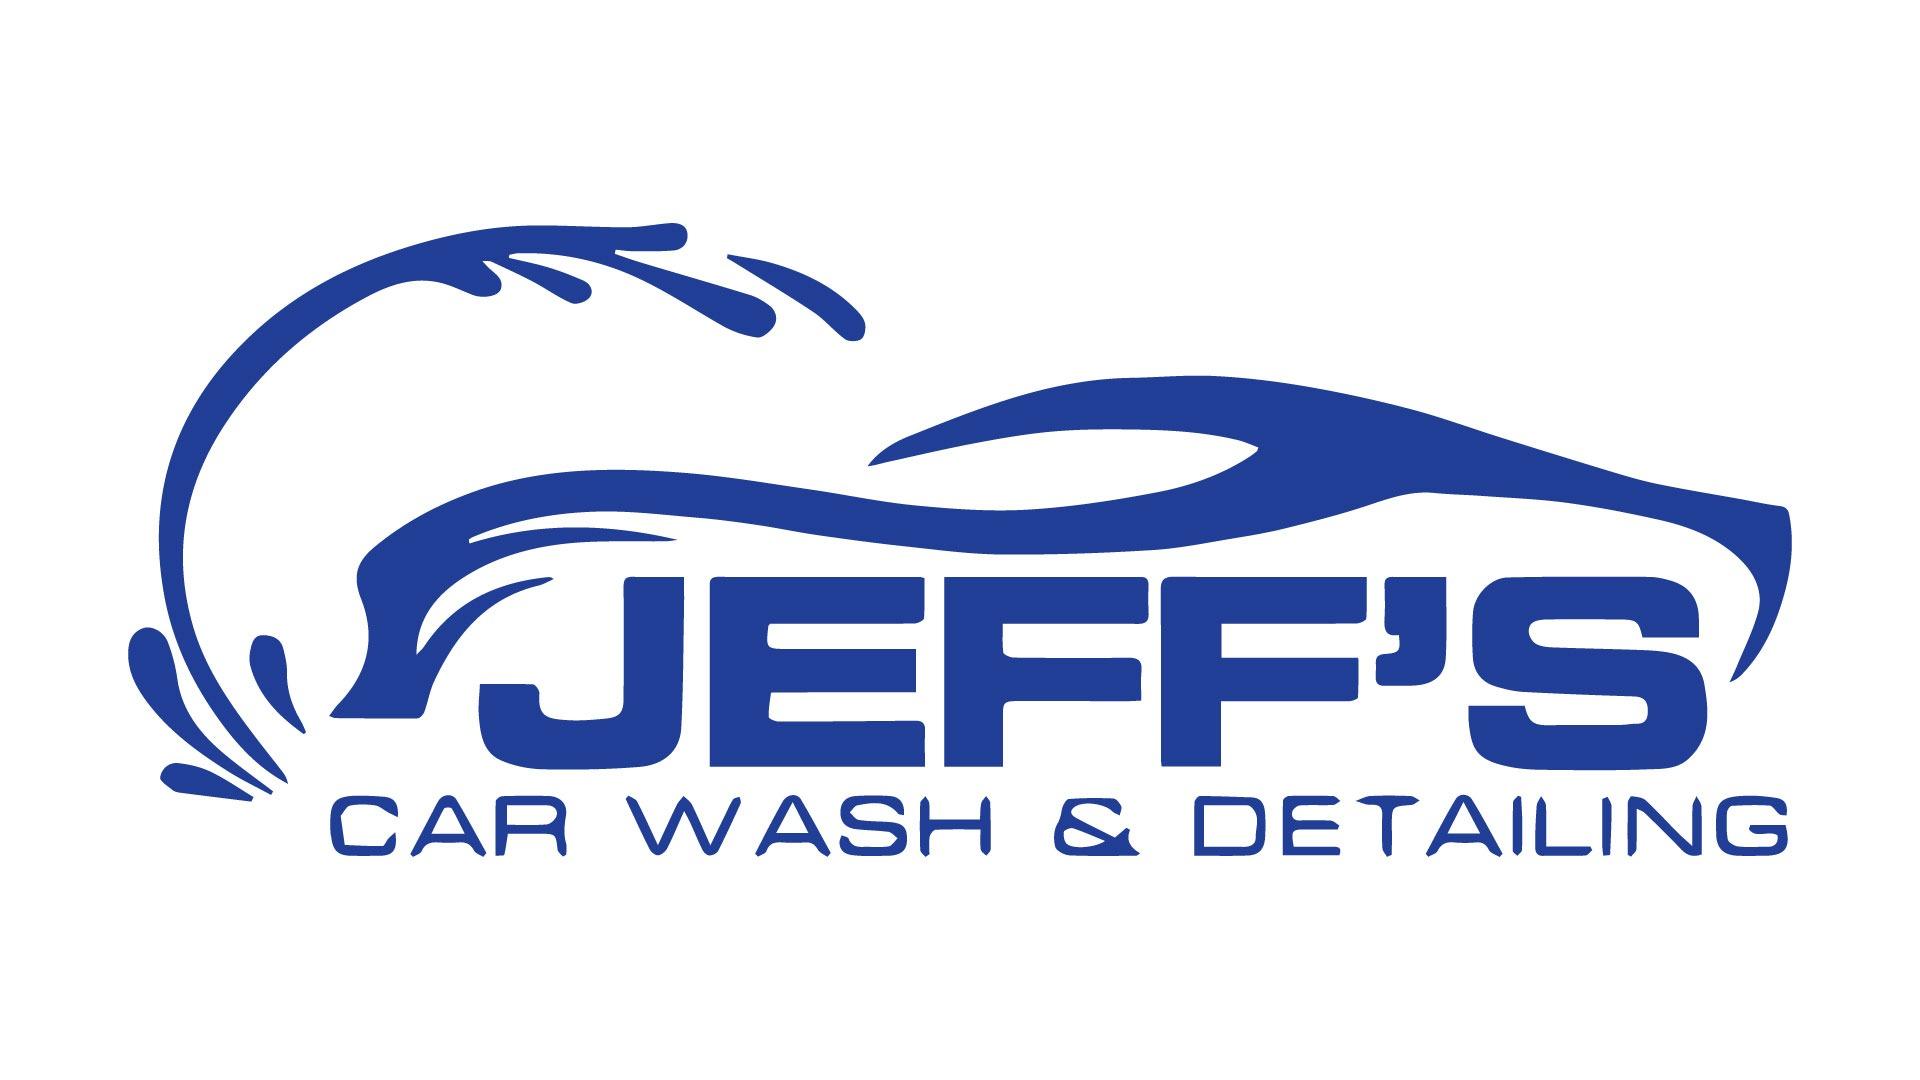 Jeffs Car Wash logo